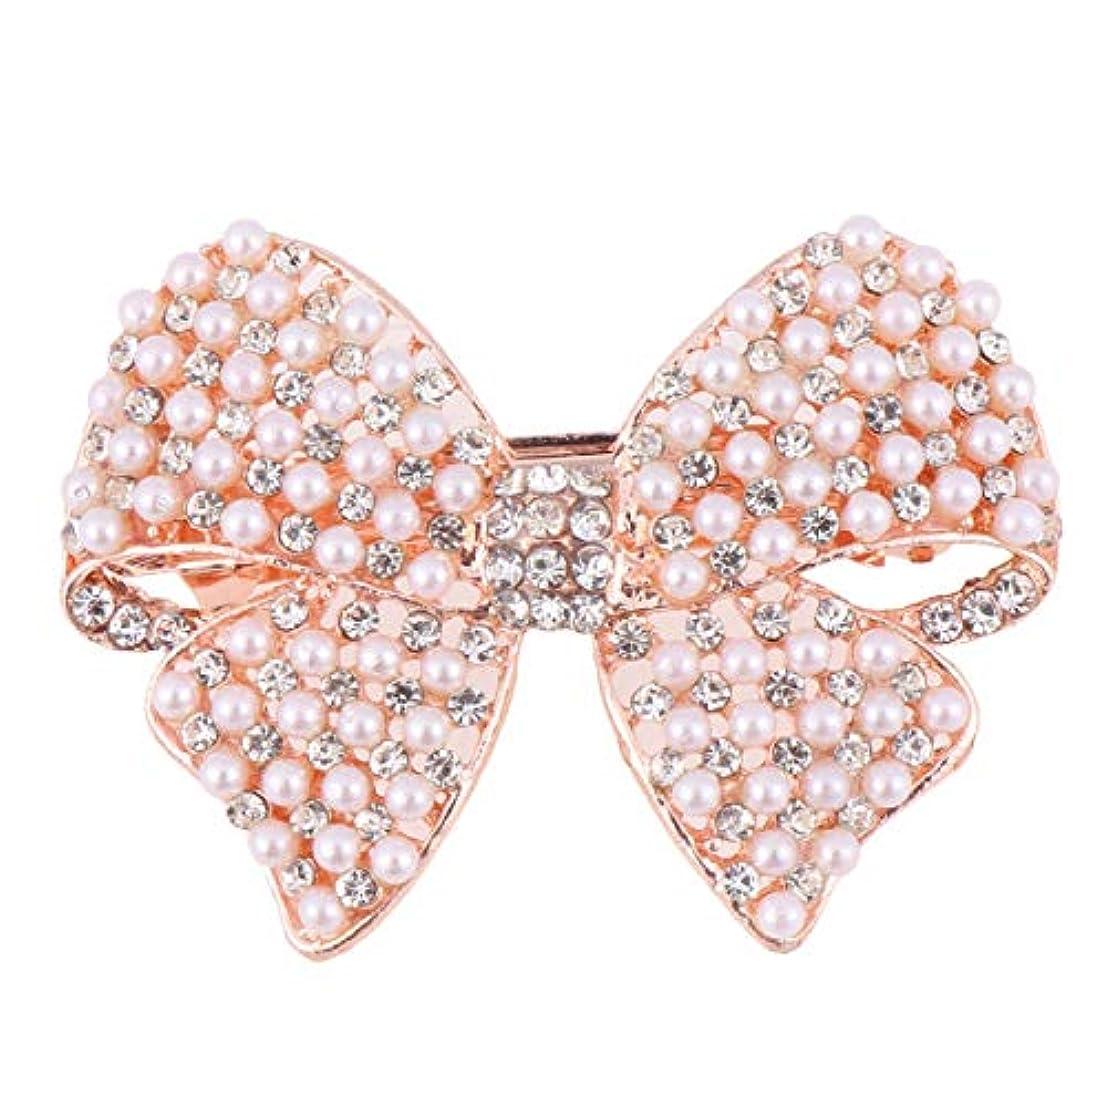 Beaupretty 女性のための真珠の弓のヘアクリップラインストーンヘアピンヘッドドレスバレッタちょう結び